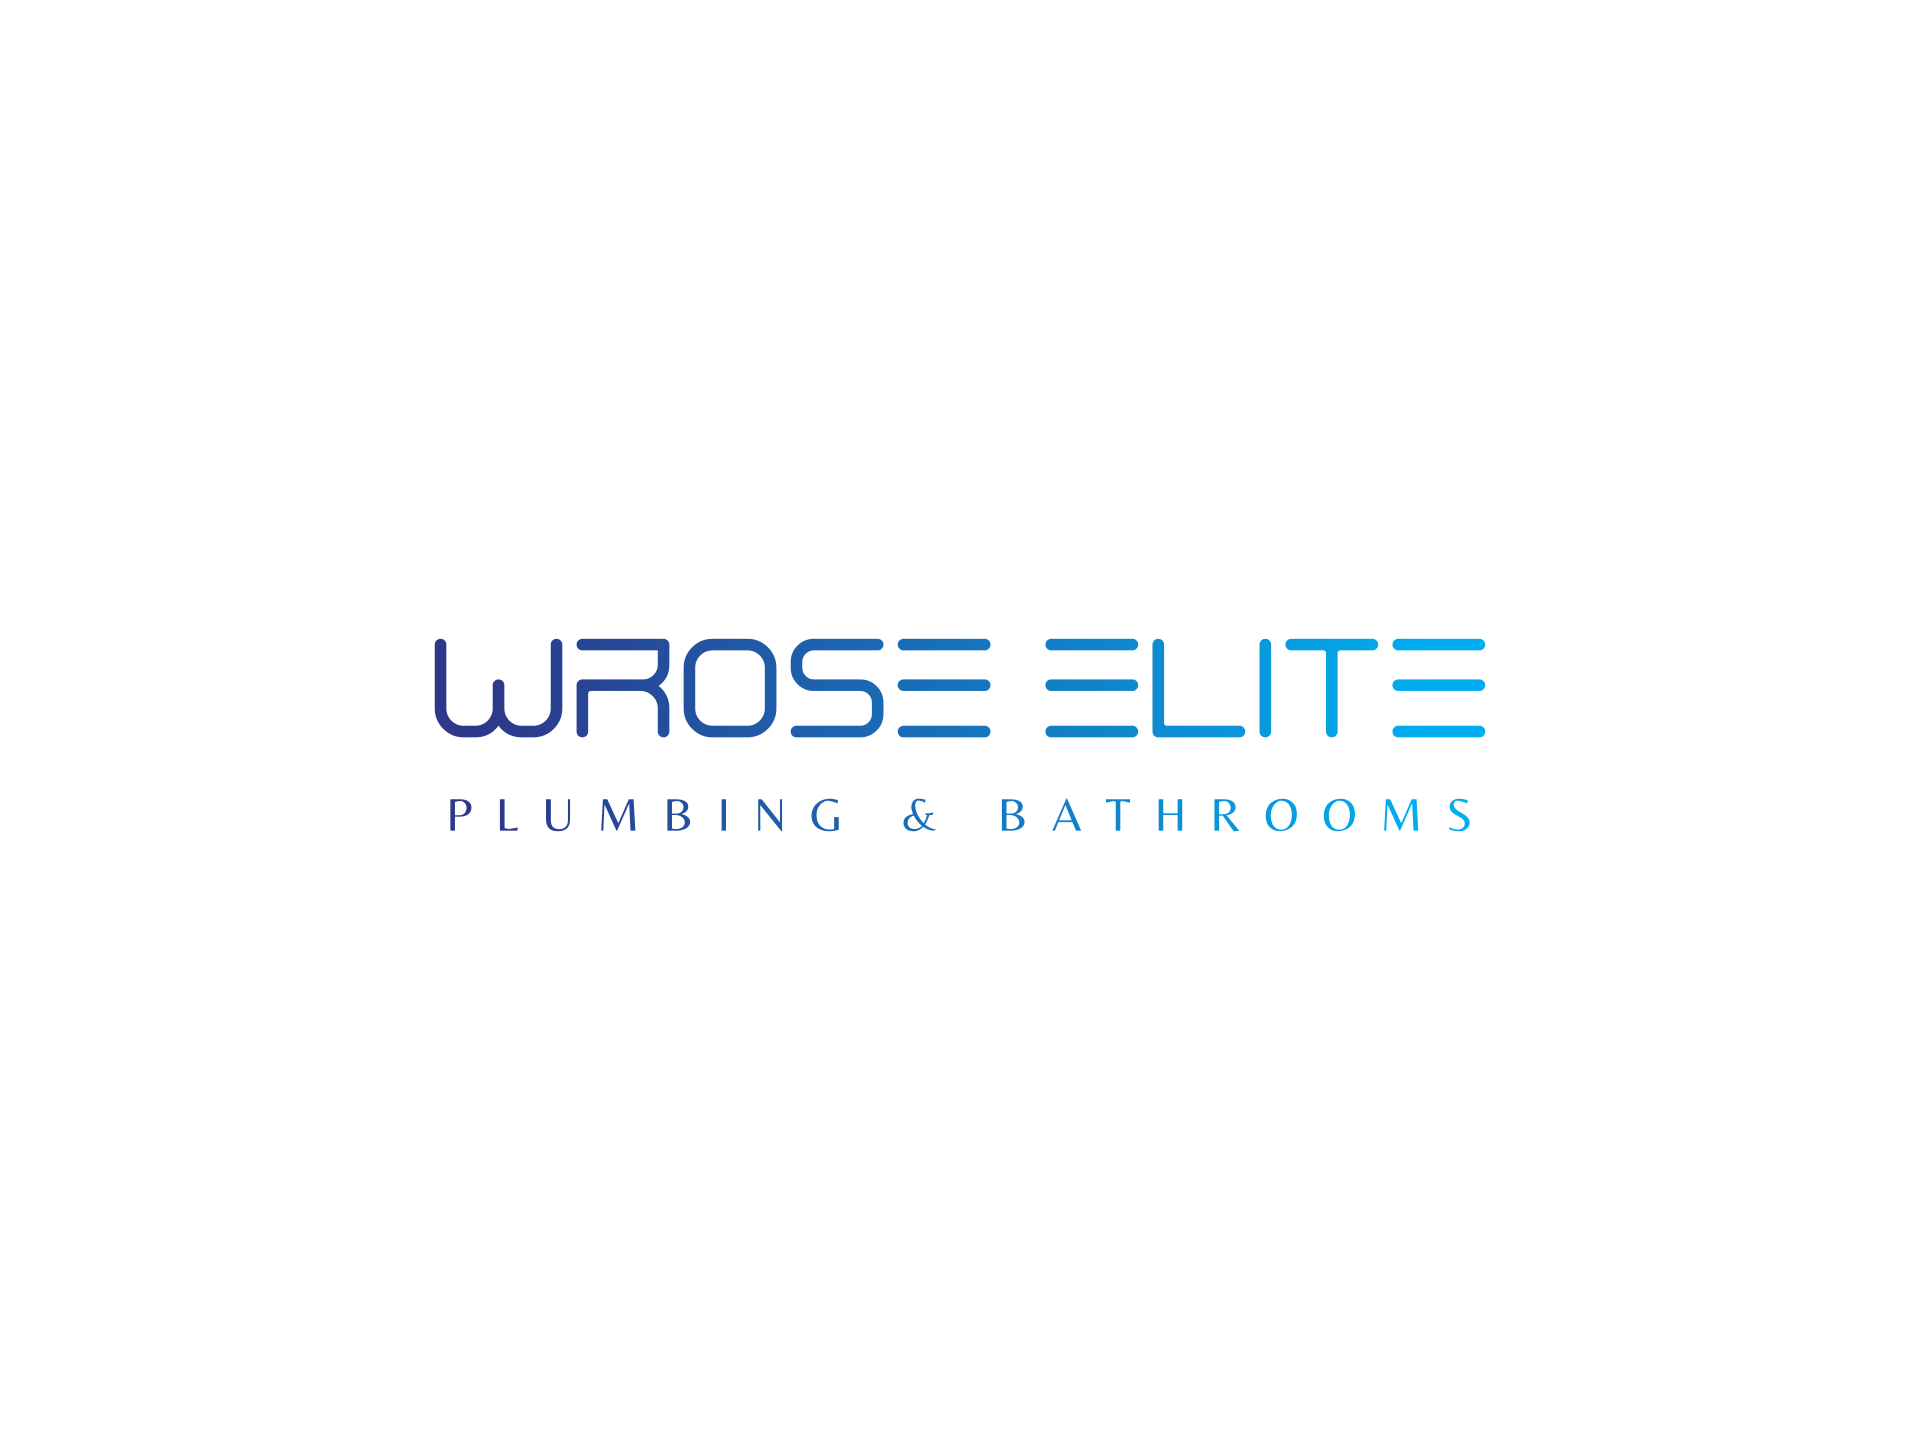 Wrose Elite Plumbing & Bathrooms Verified Logo